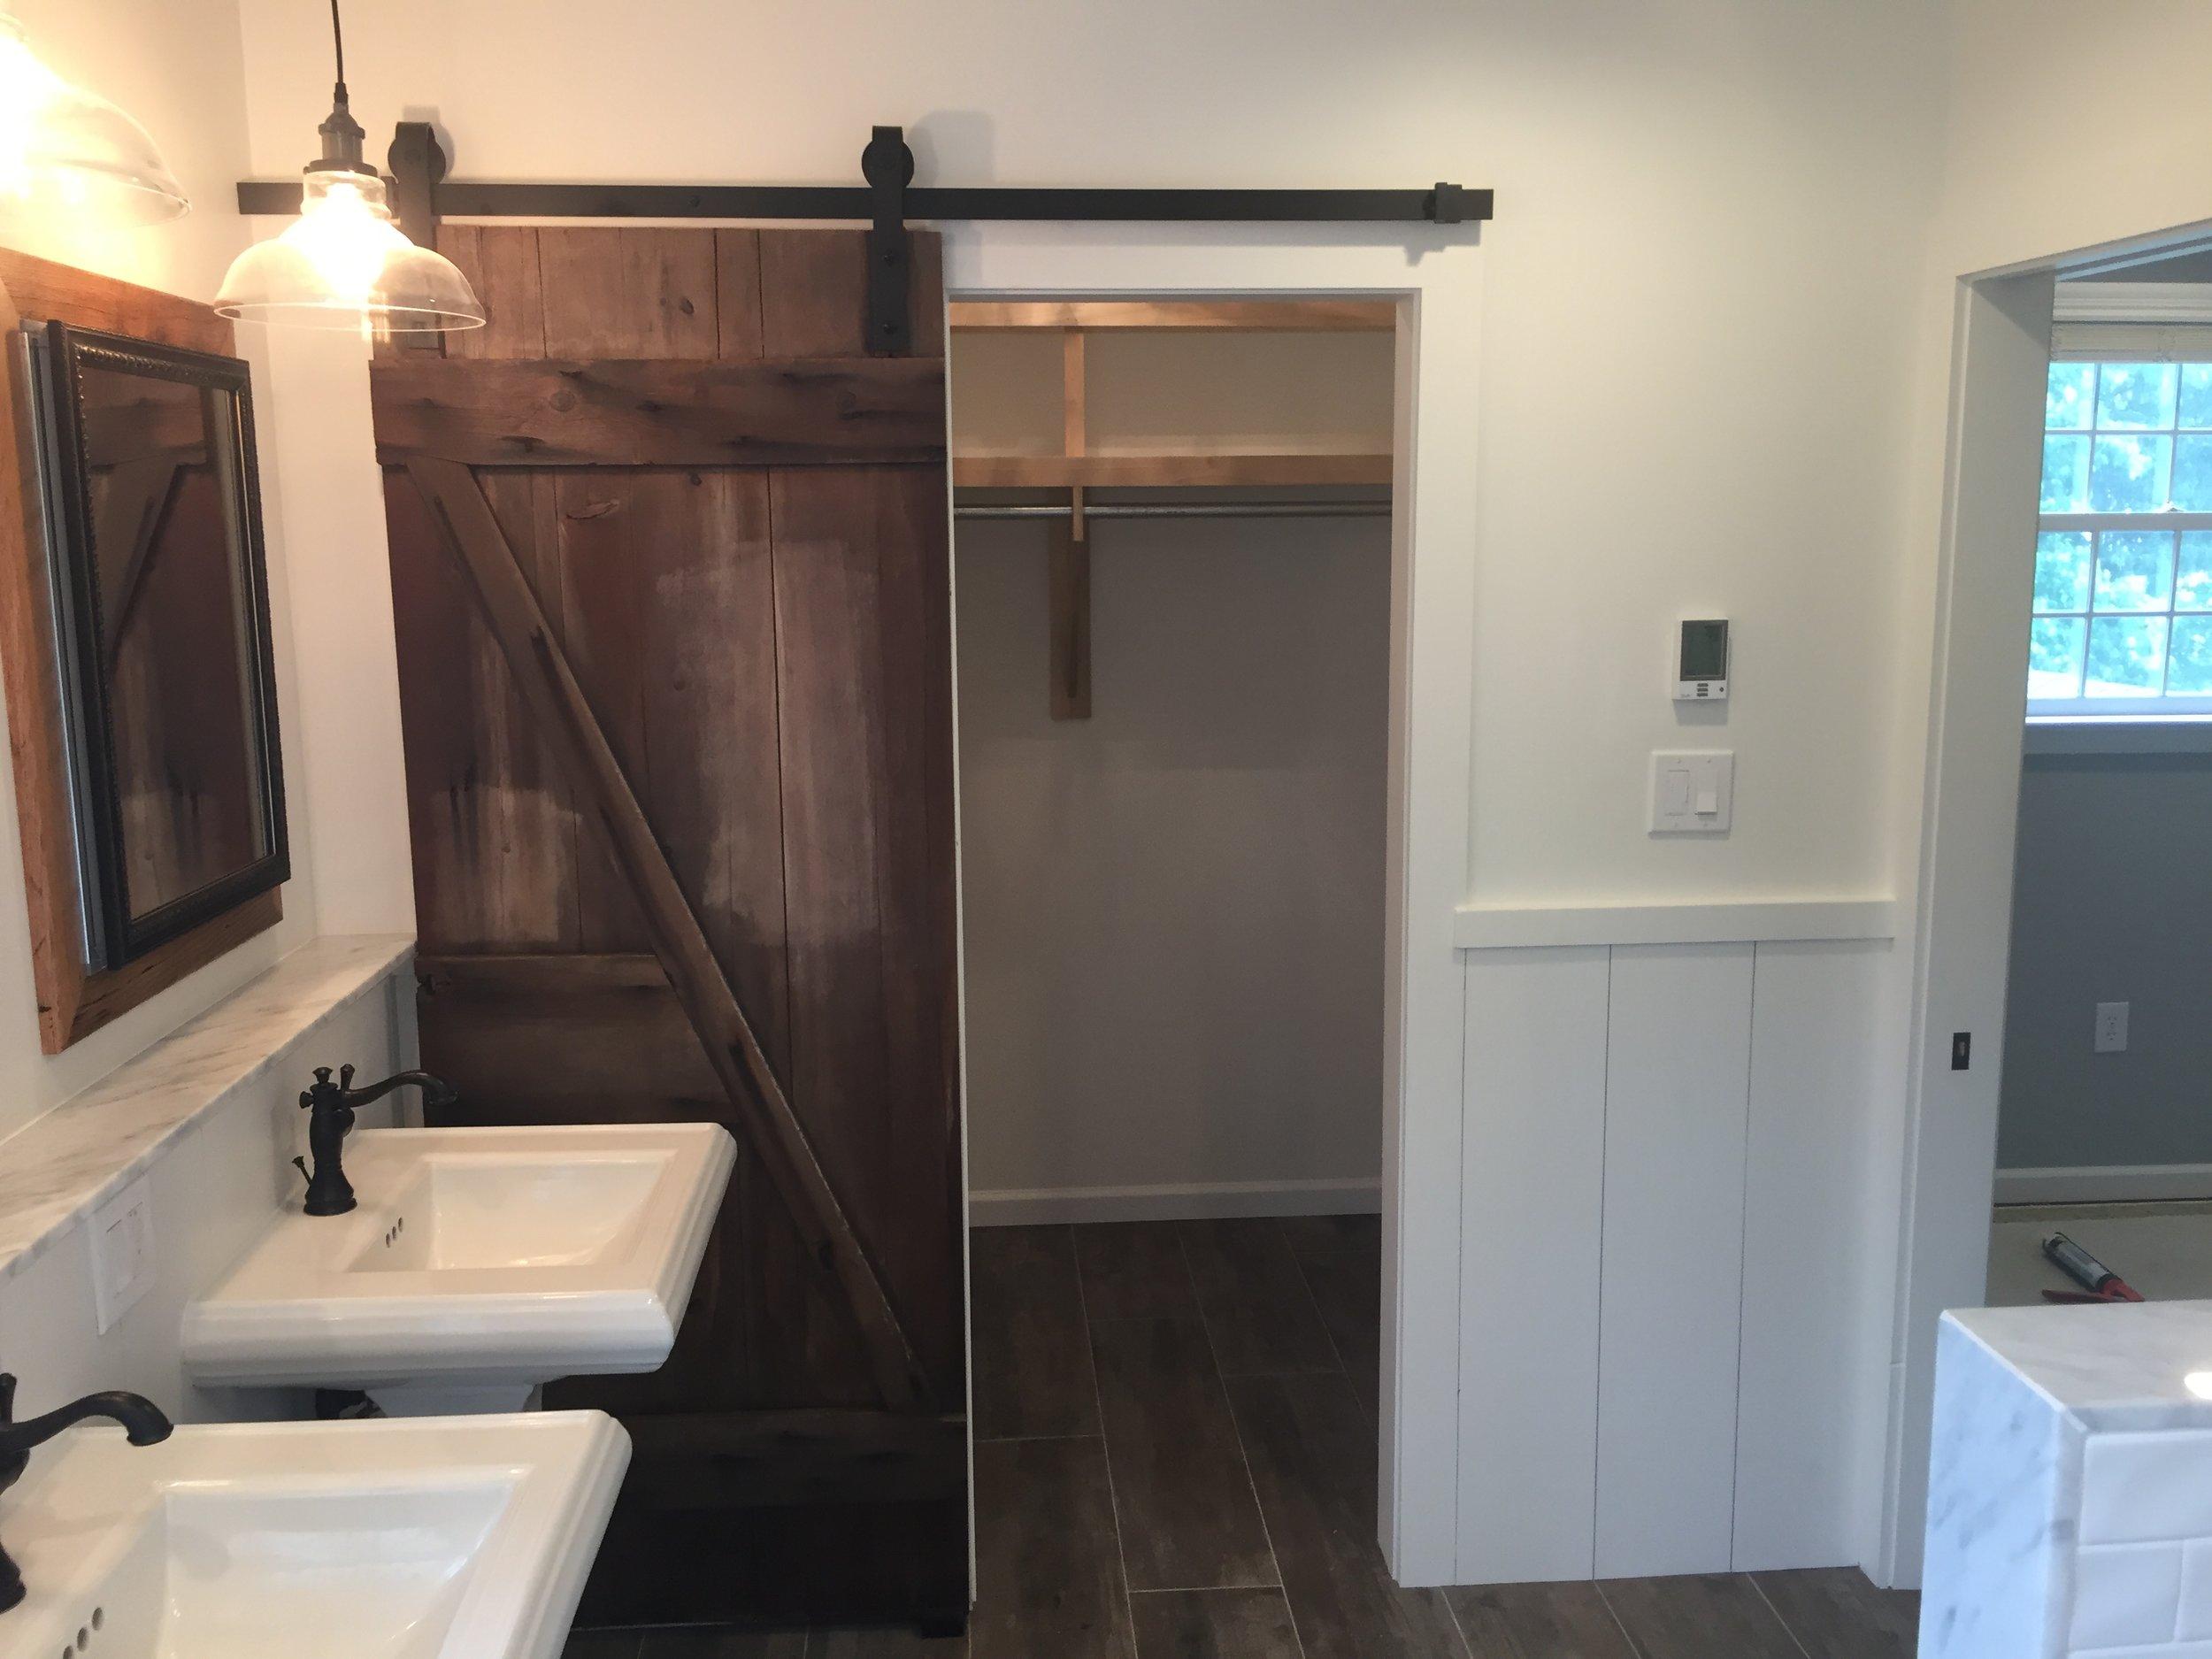 terri feralio - finished bathroom (3).JPG